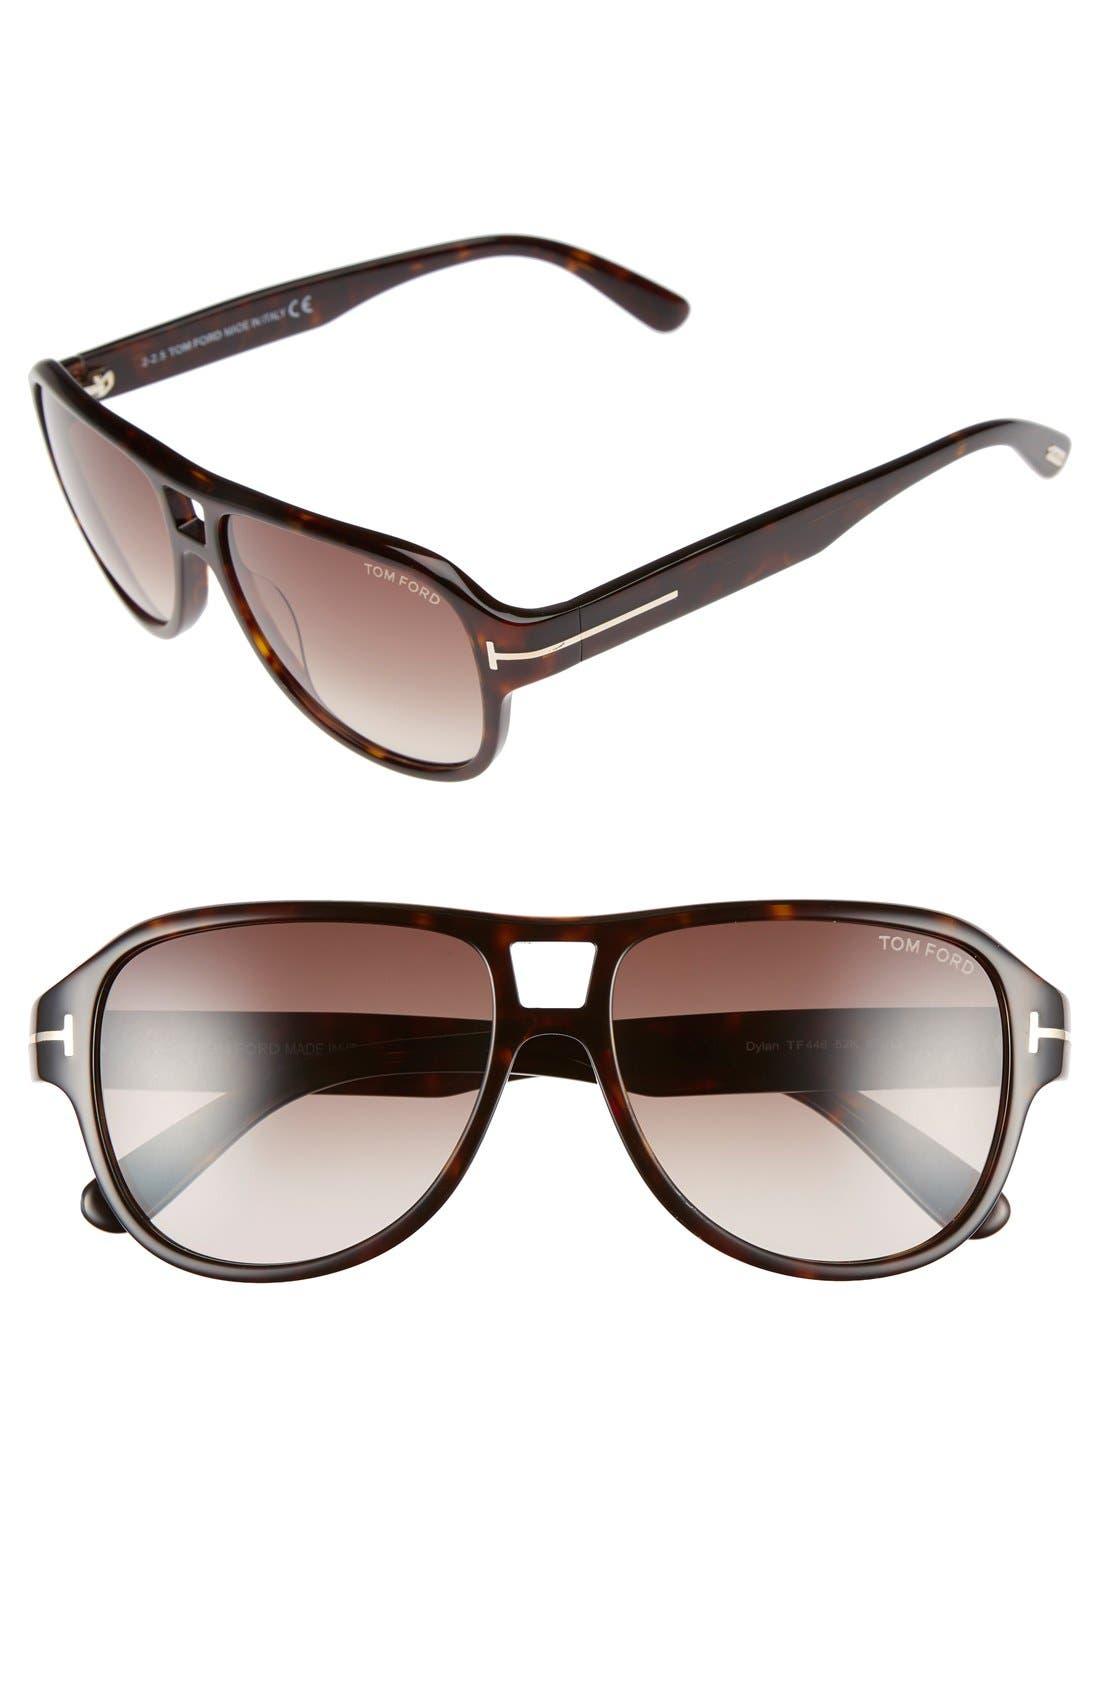 Dylan 57mm Aviator Sunglasses,                             Main thumbnail 1, color,                             200